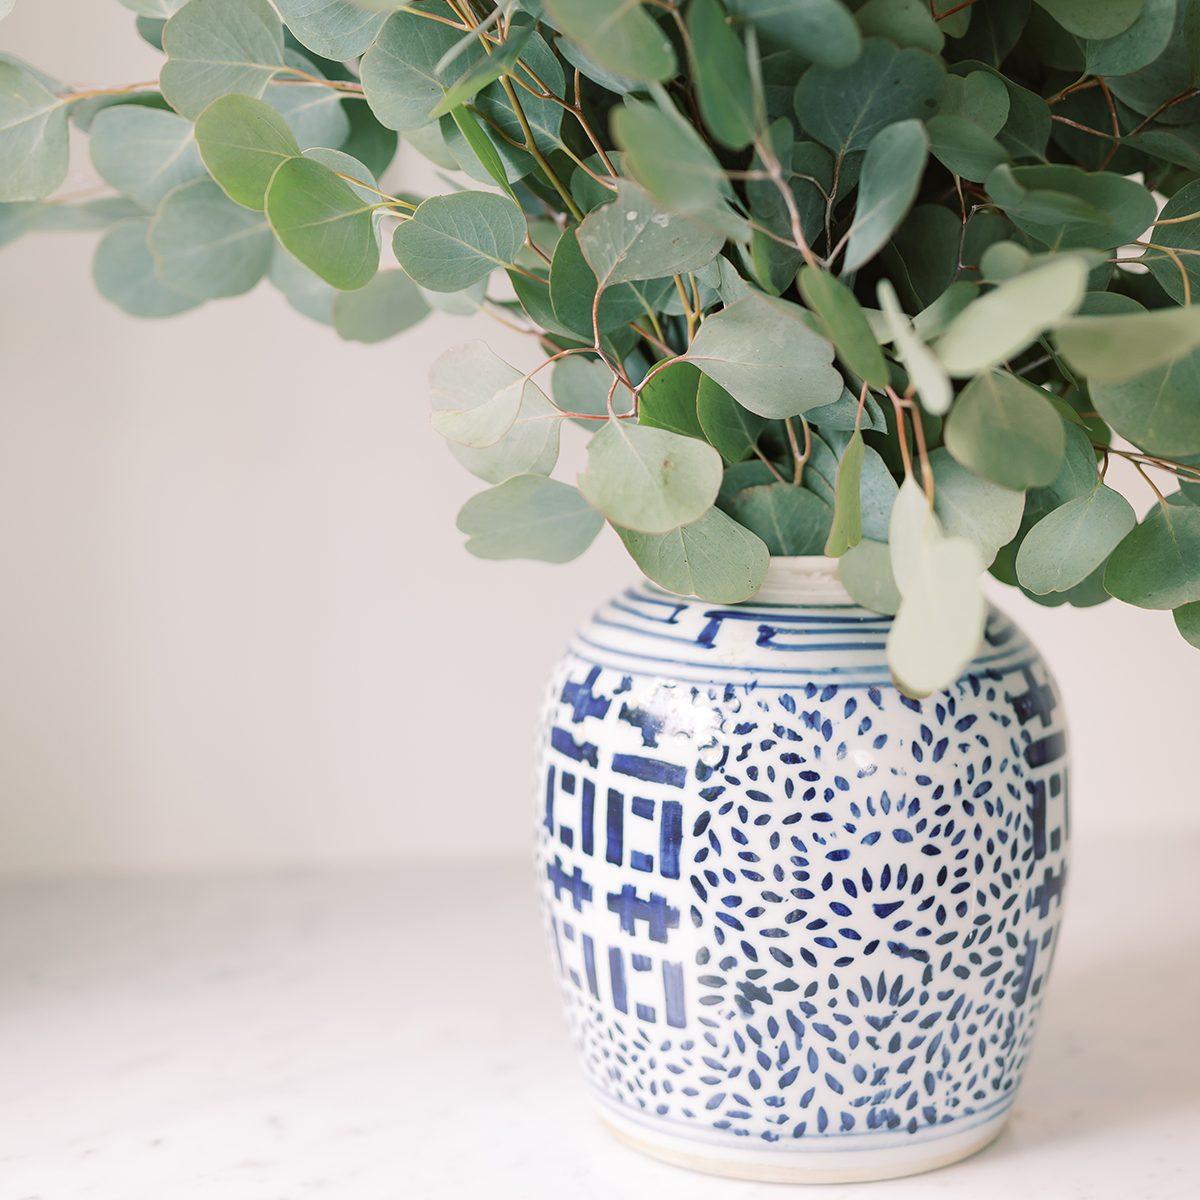 Eucalyptus in blue and white vase